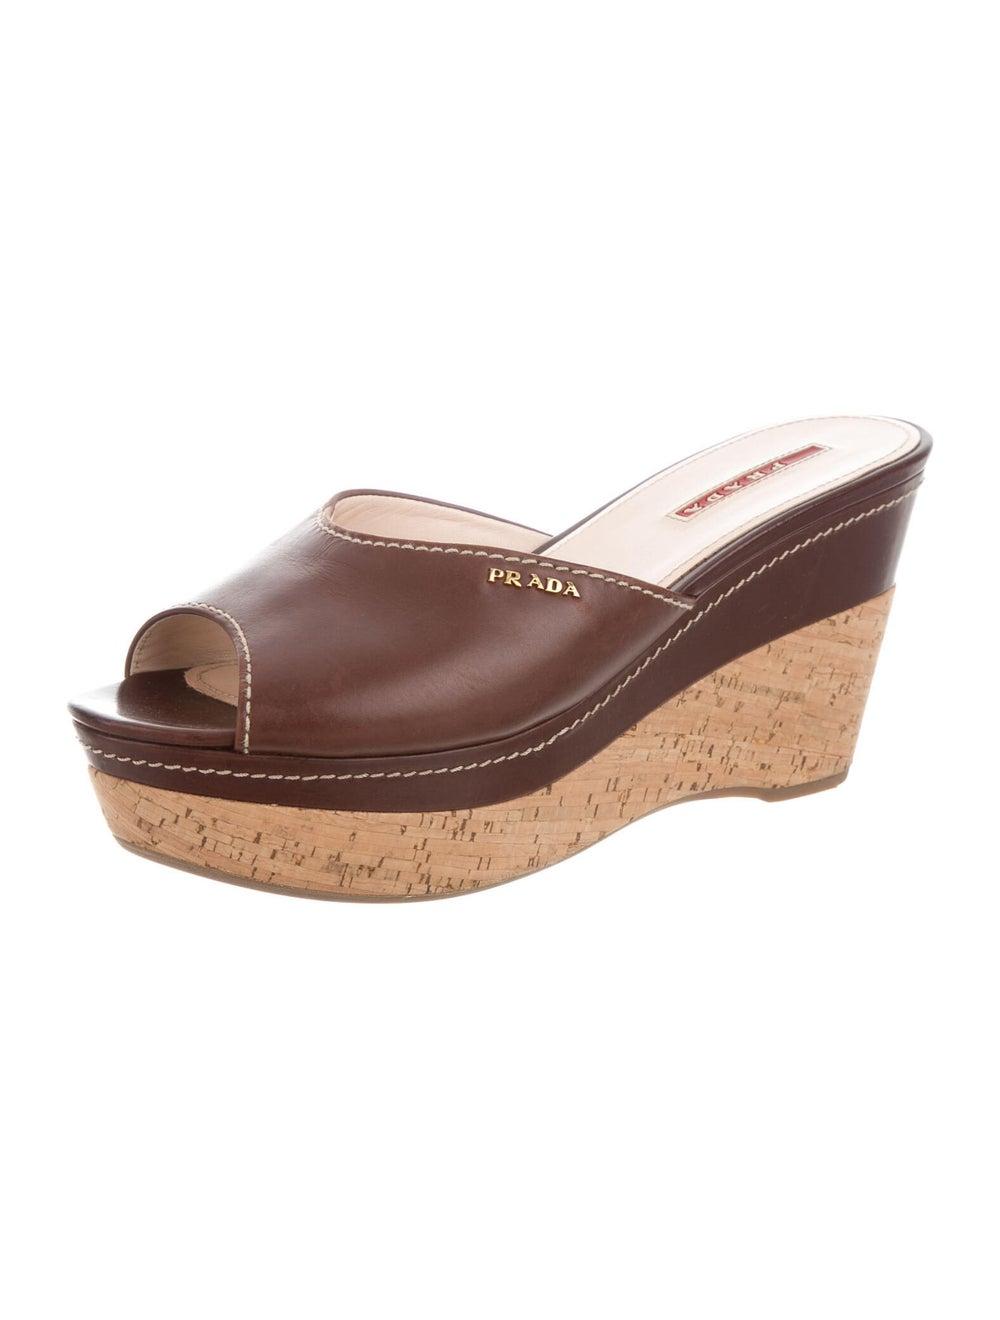 Prada Sport Leather Slides Brown - image 2